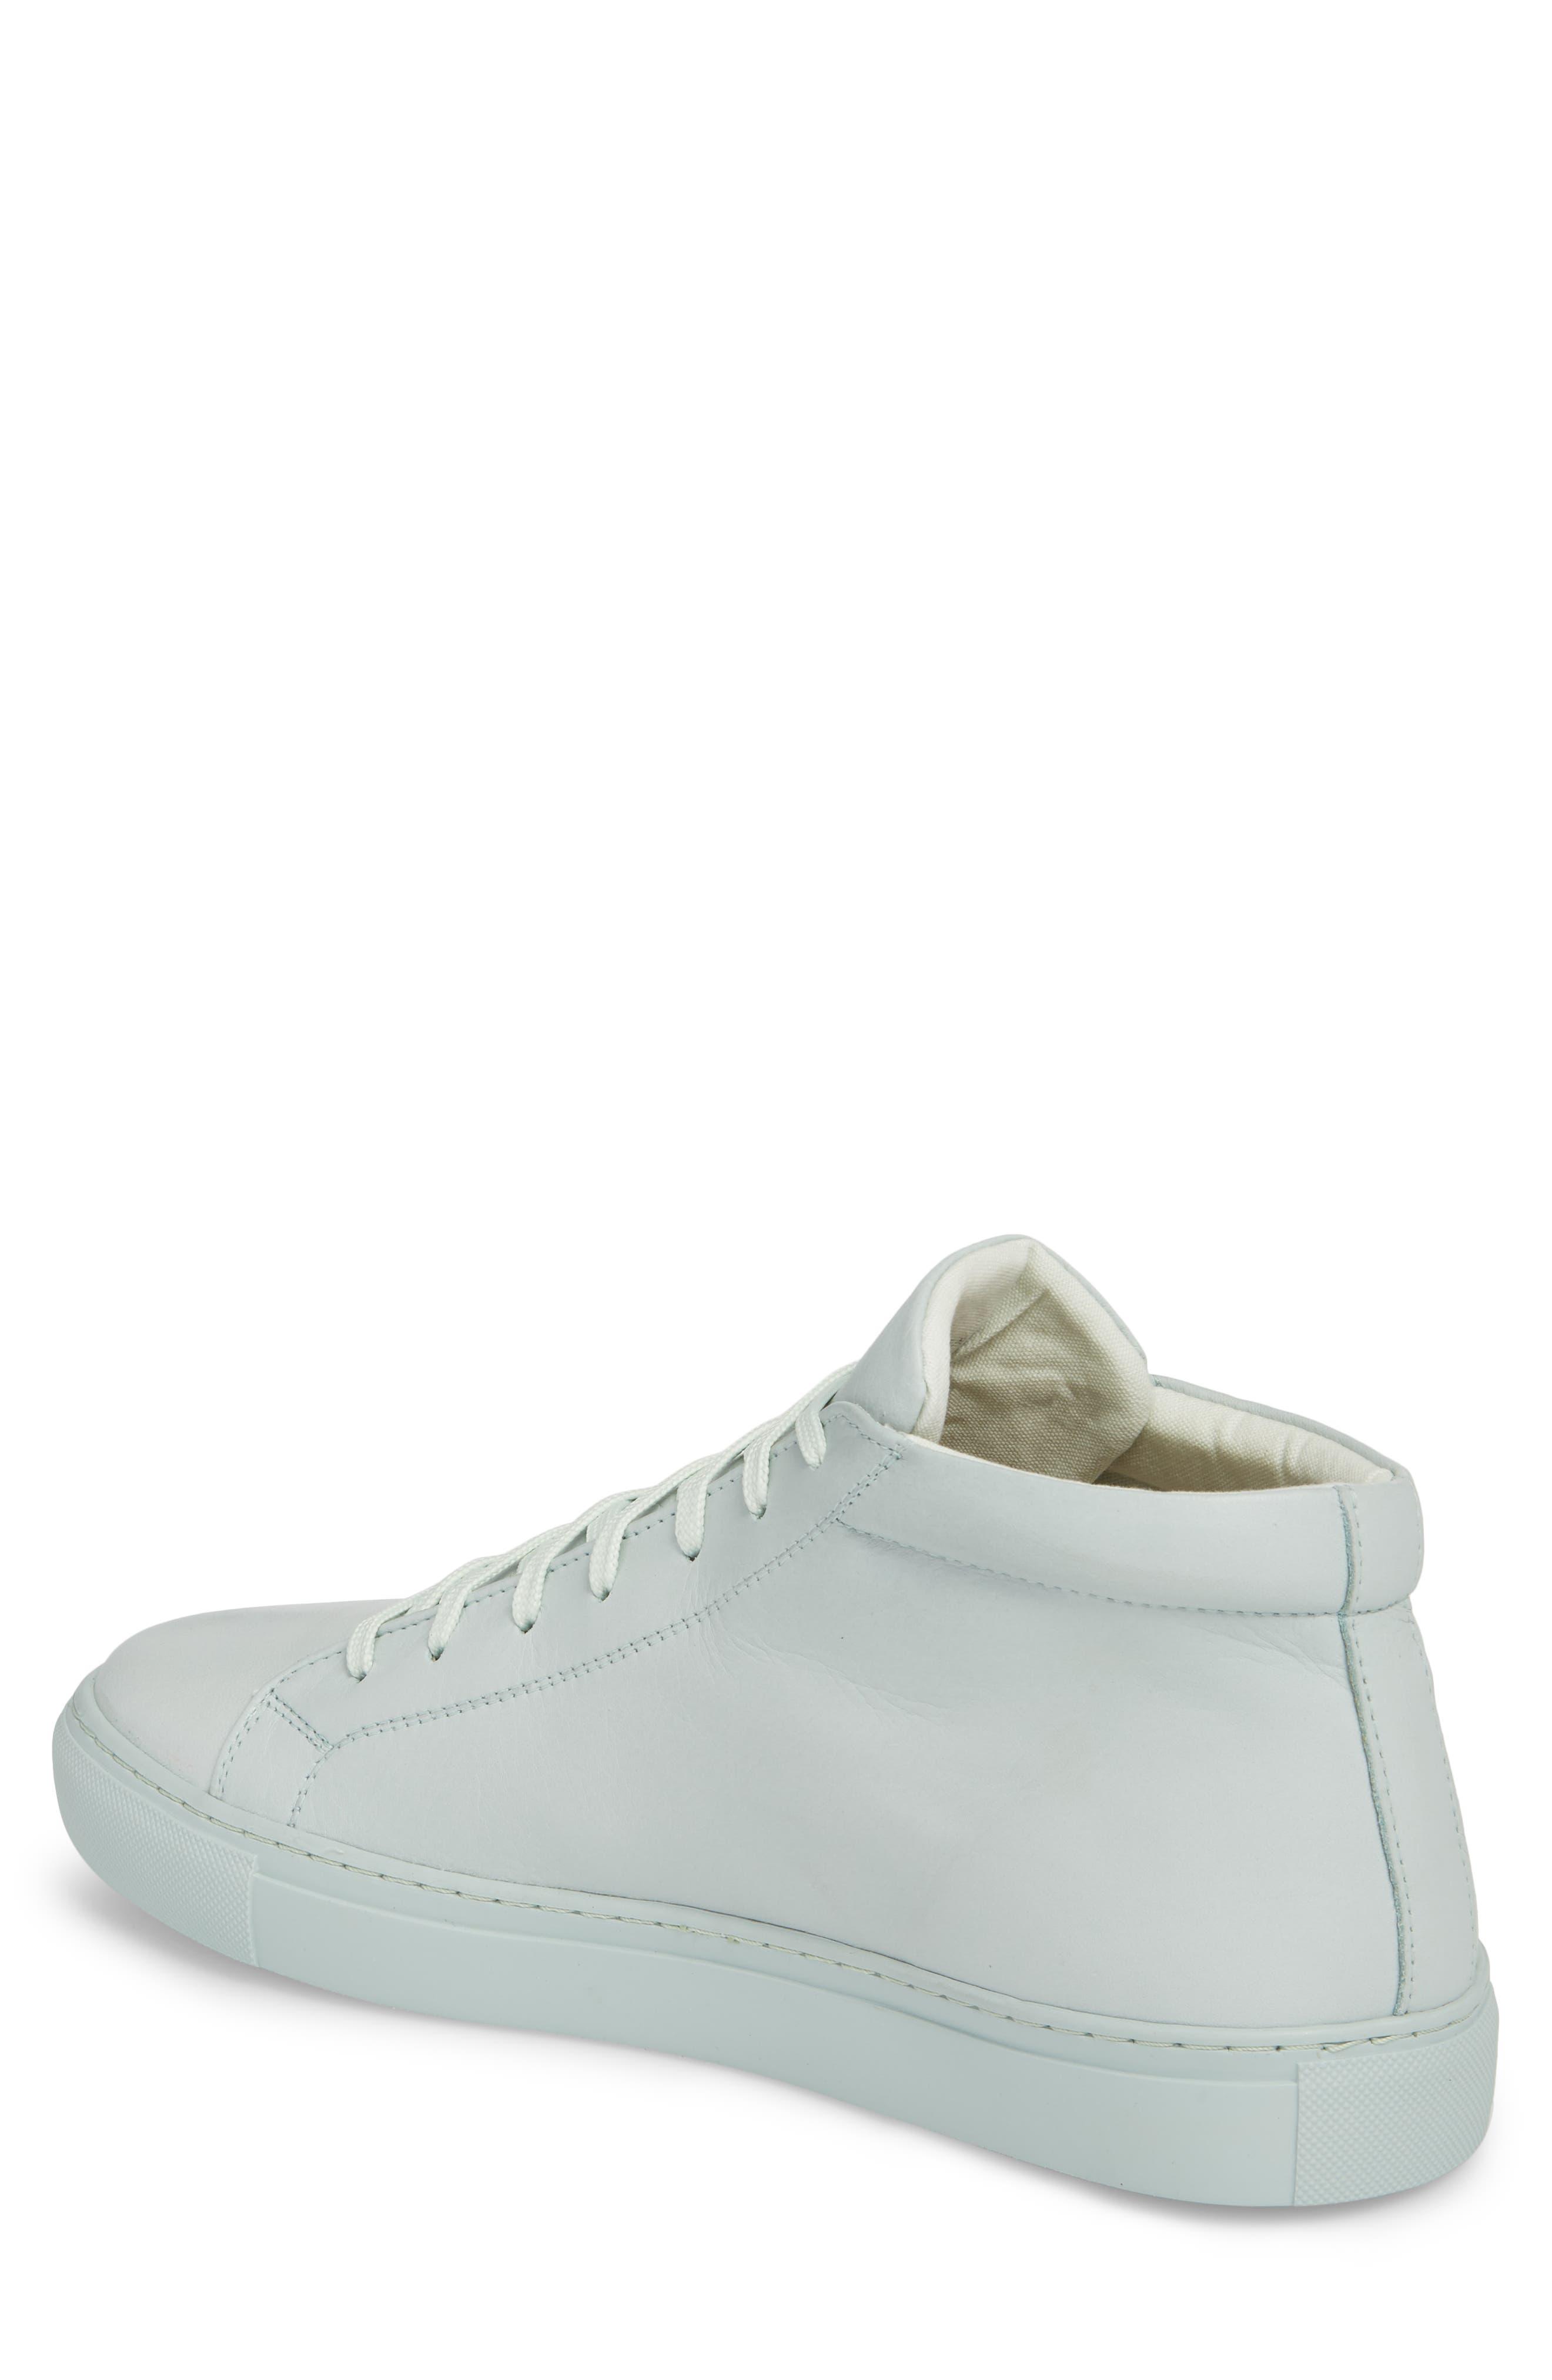 Lexington Mid Top Sneaker,                             Alternate thumbnail 2, color,                             303